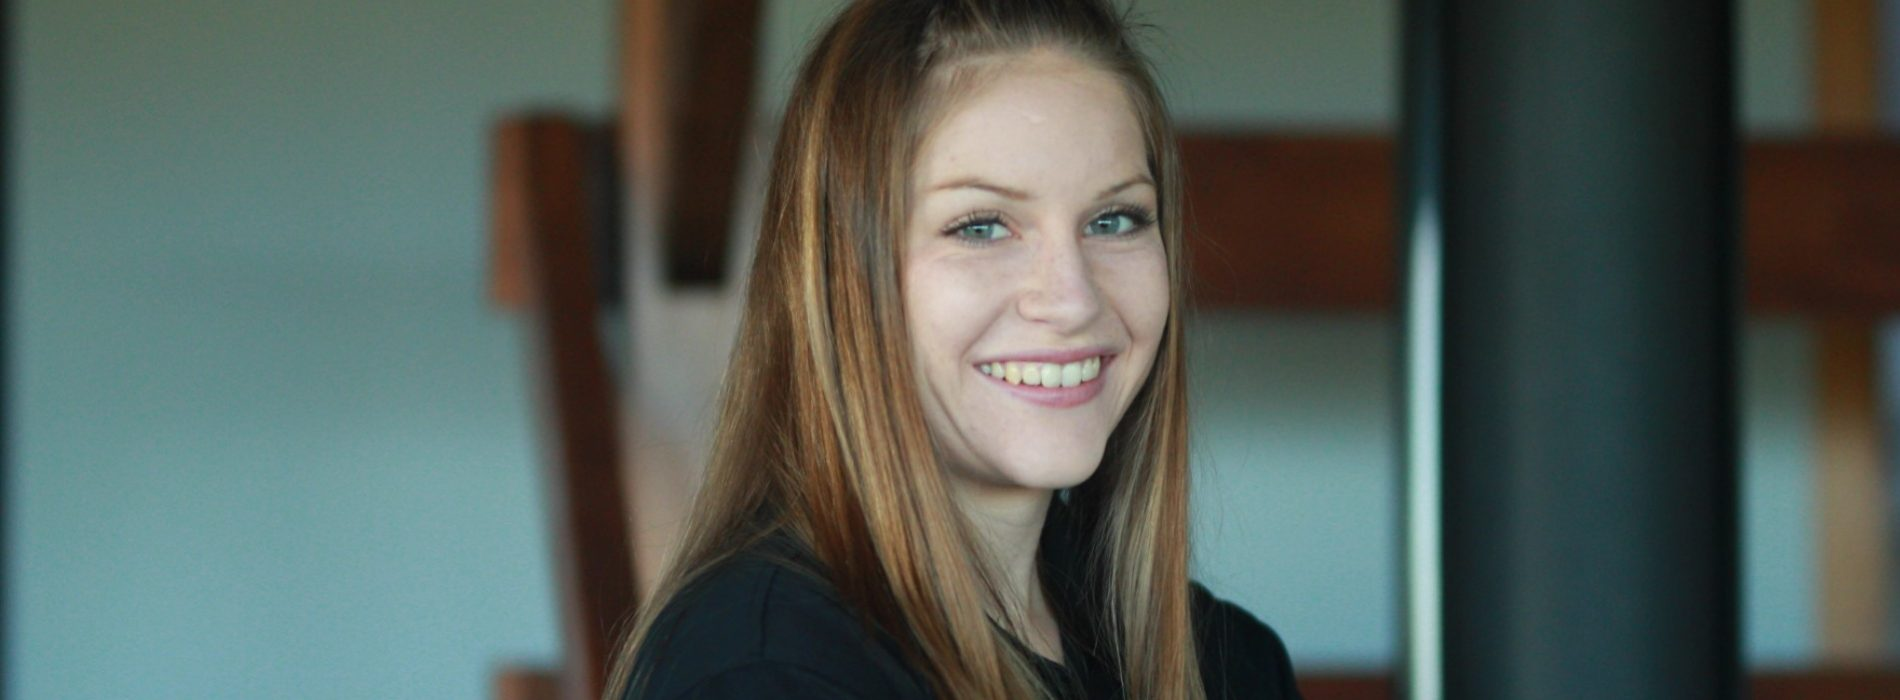 Rachael Archer catch-up mid GNCC WXC debut season